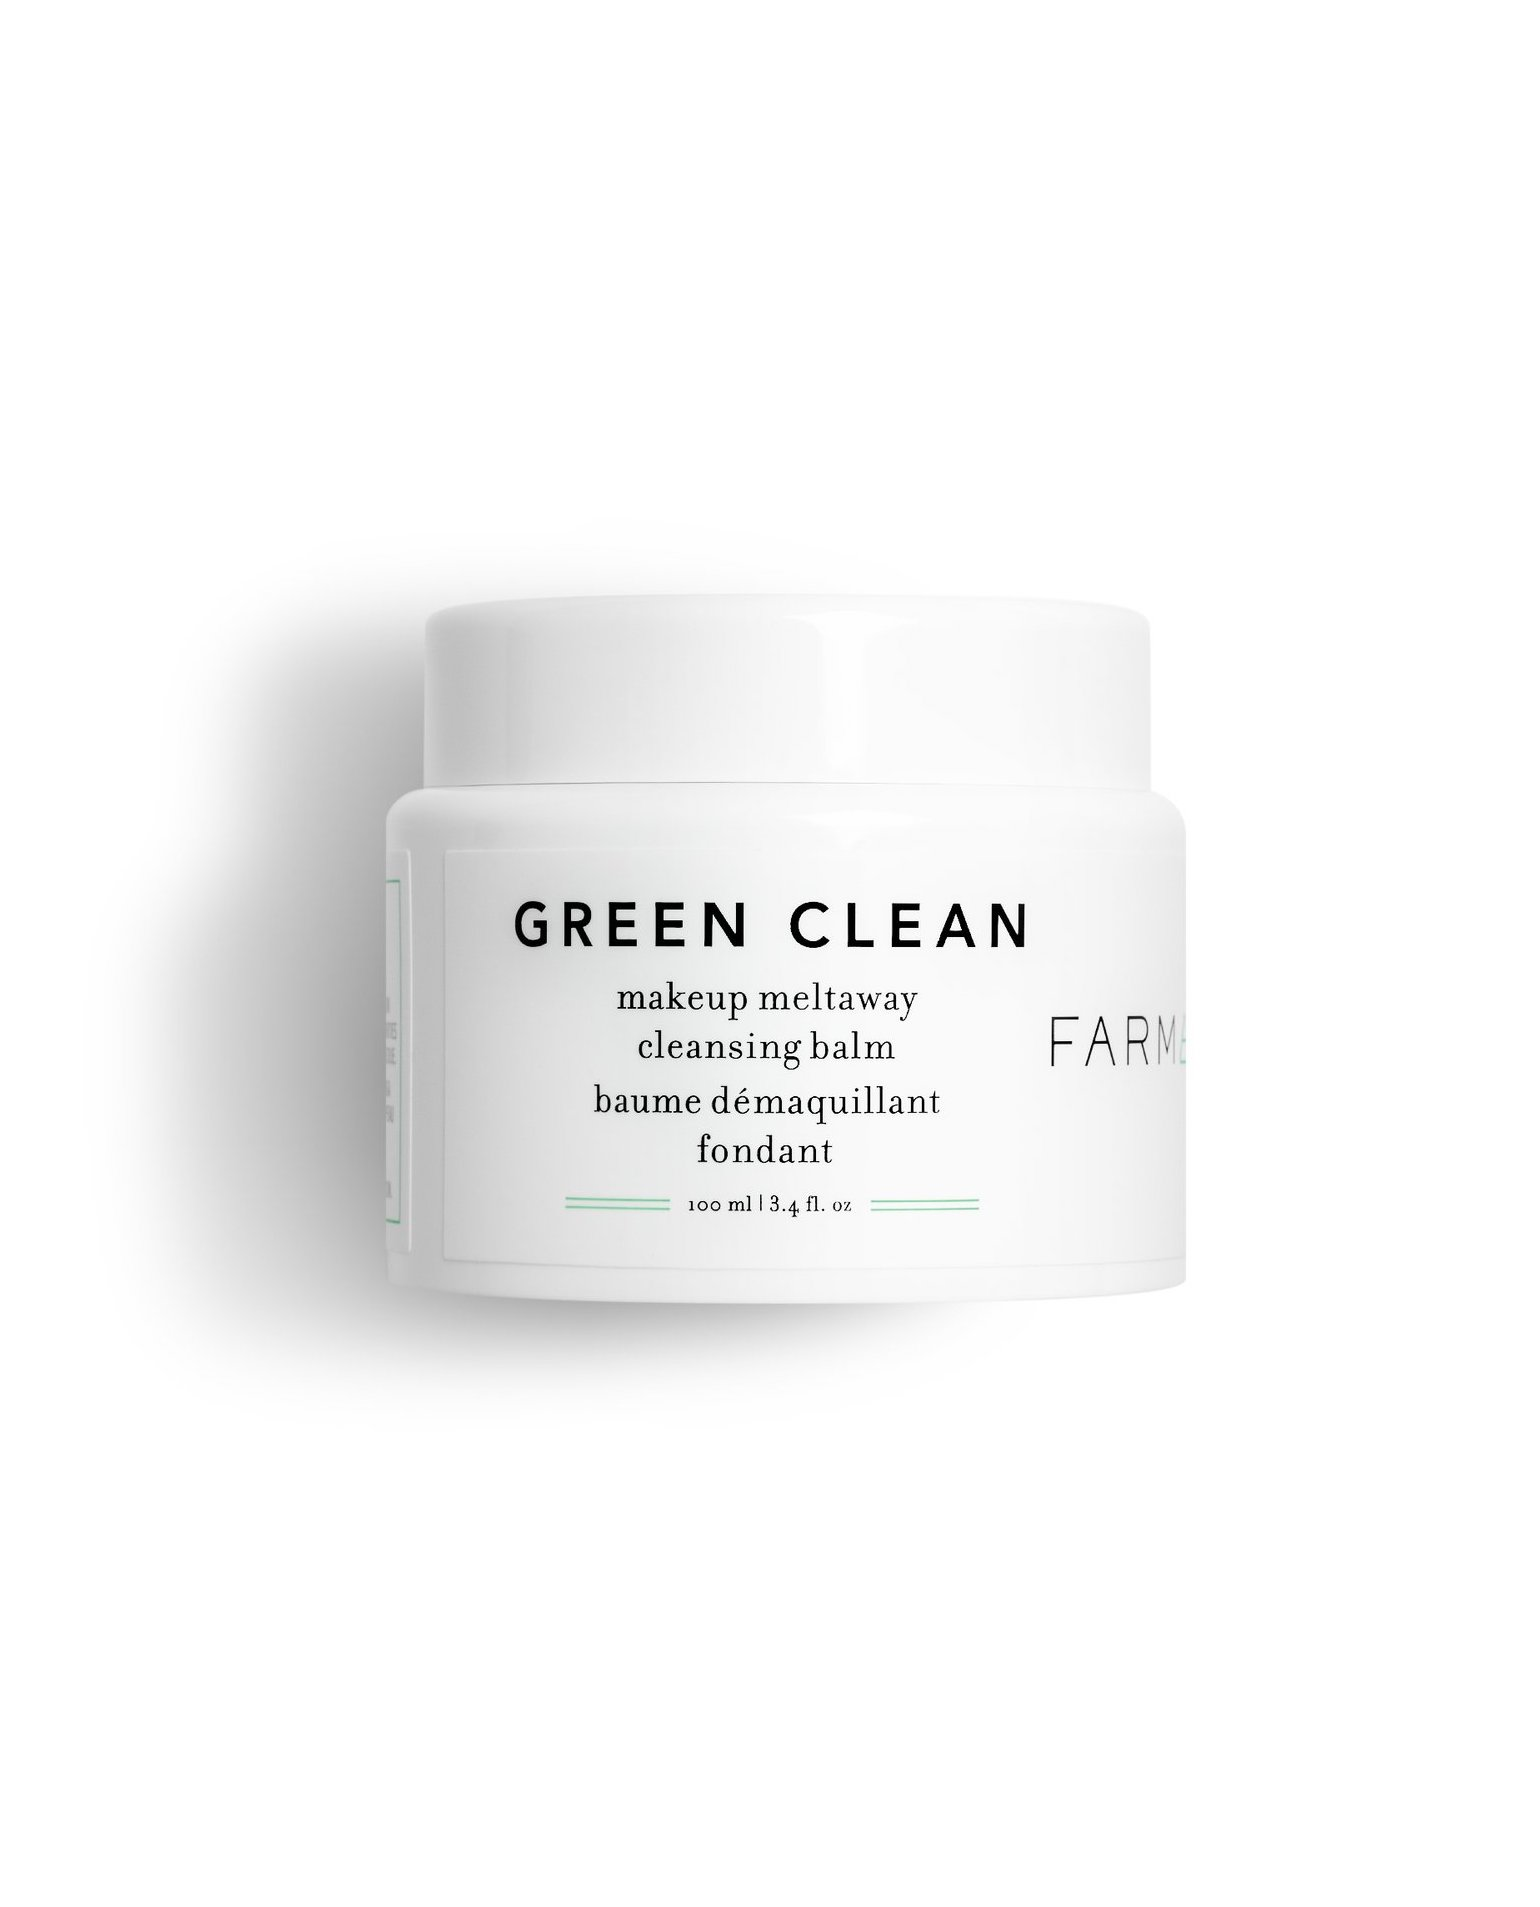 Farmacy cleansing balm